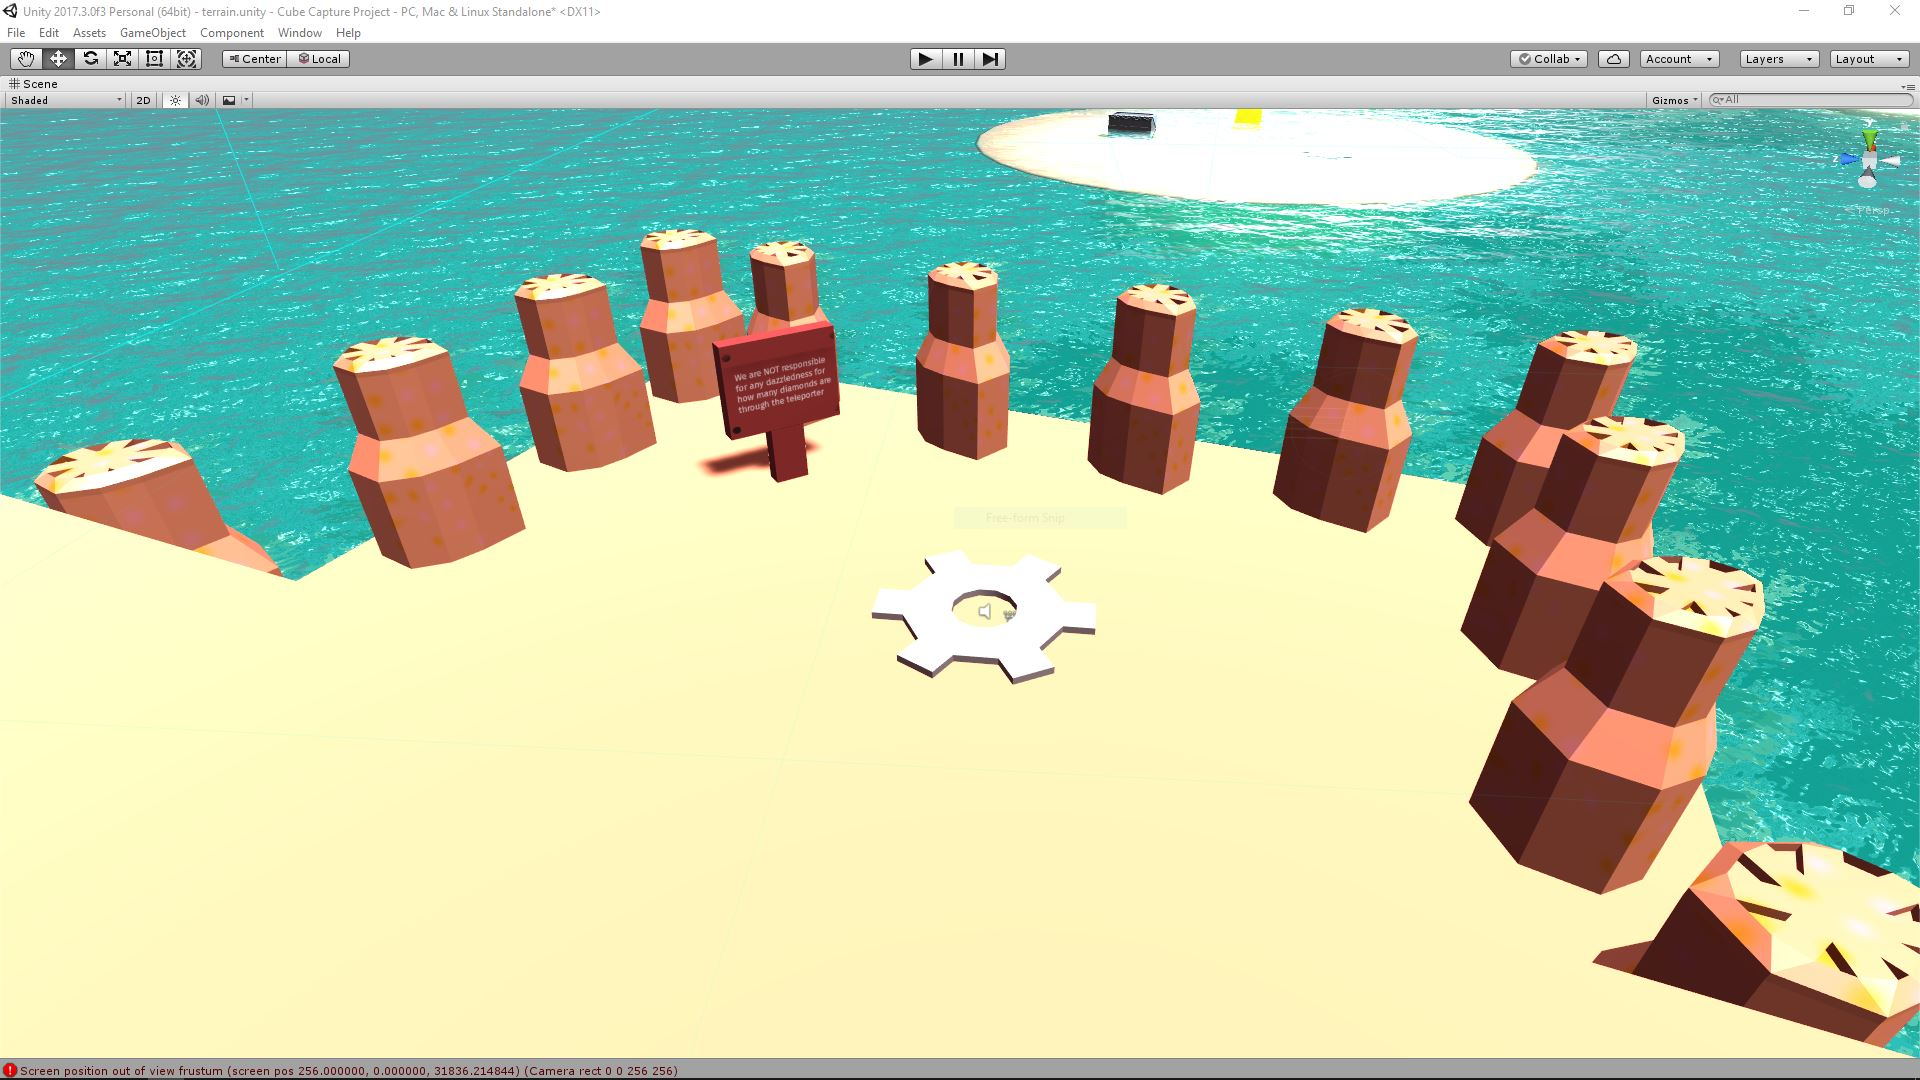 Cube Capture Progress - Cube Capture 0 2 6 (Pre-Alpha) by